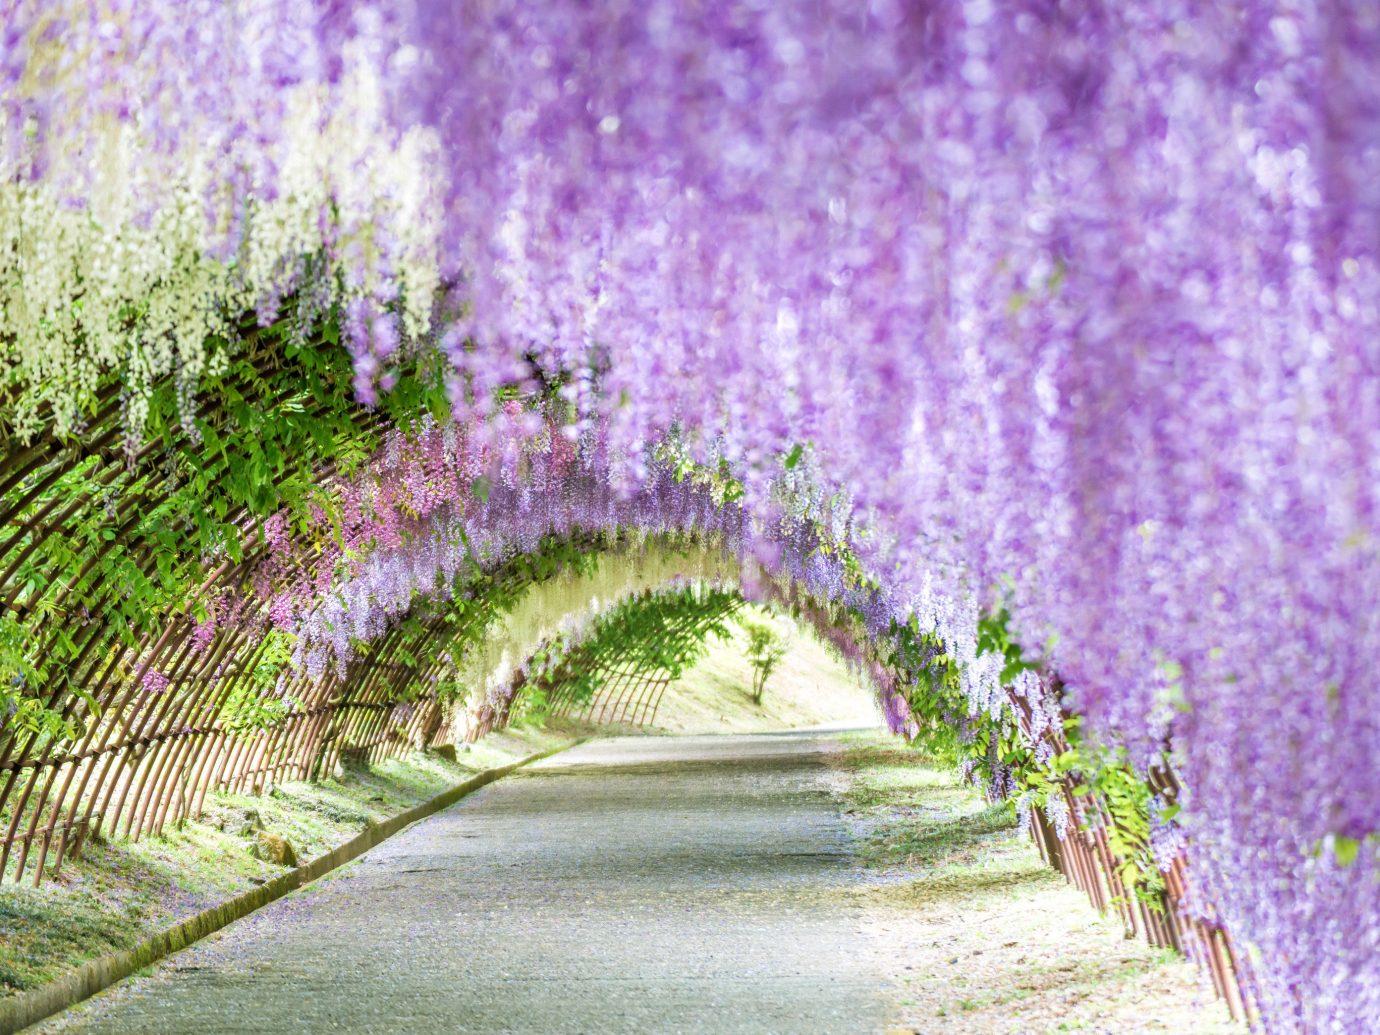 Japan Trip Ideas tree grass green outdoor purple vegetation flower plant english lavender lavender flora spring field sky landscape grass family shrub